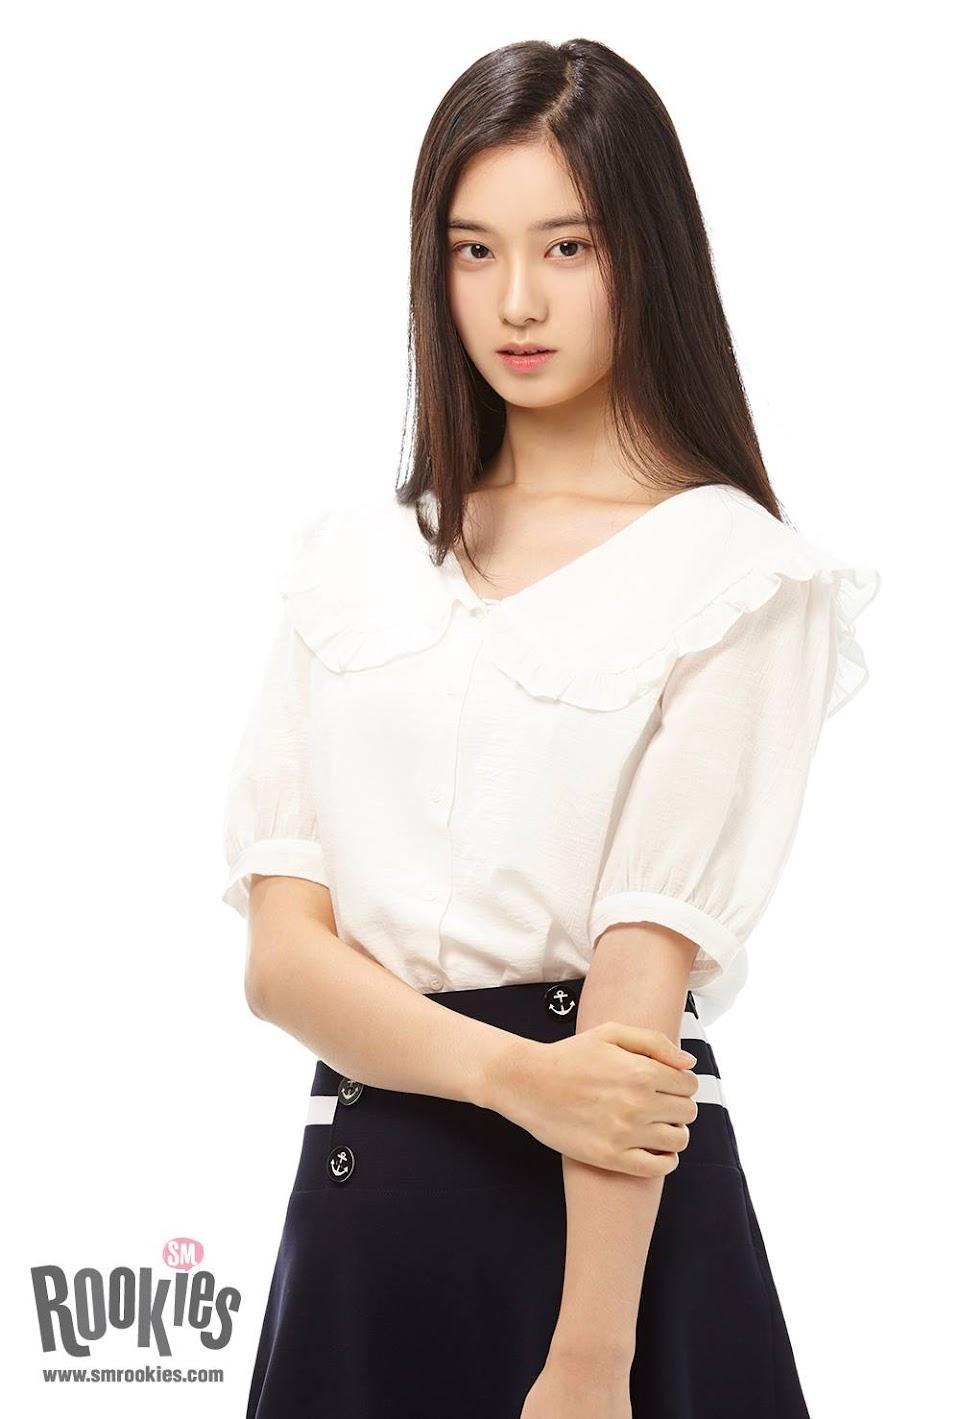 yiyang sm trainee 6